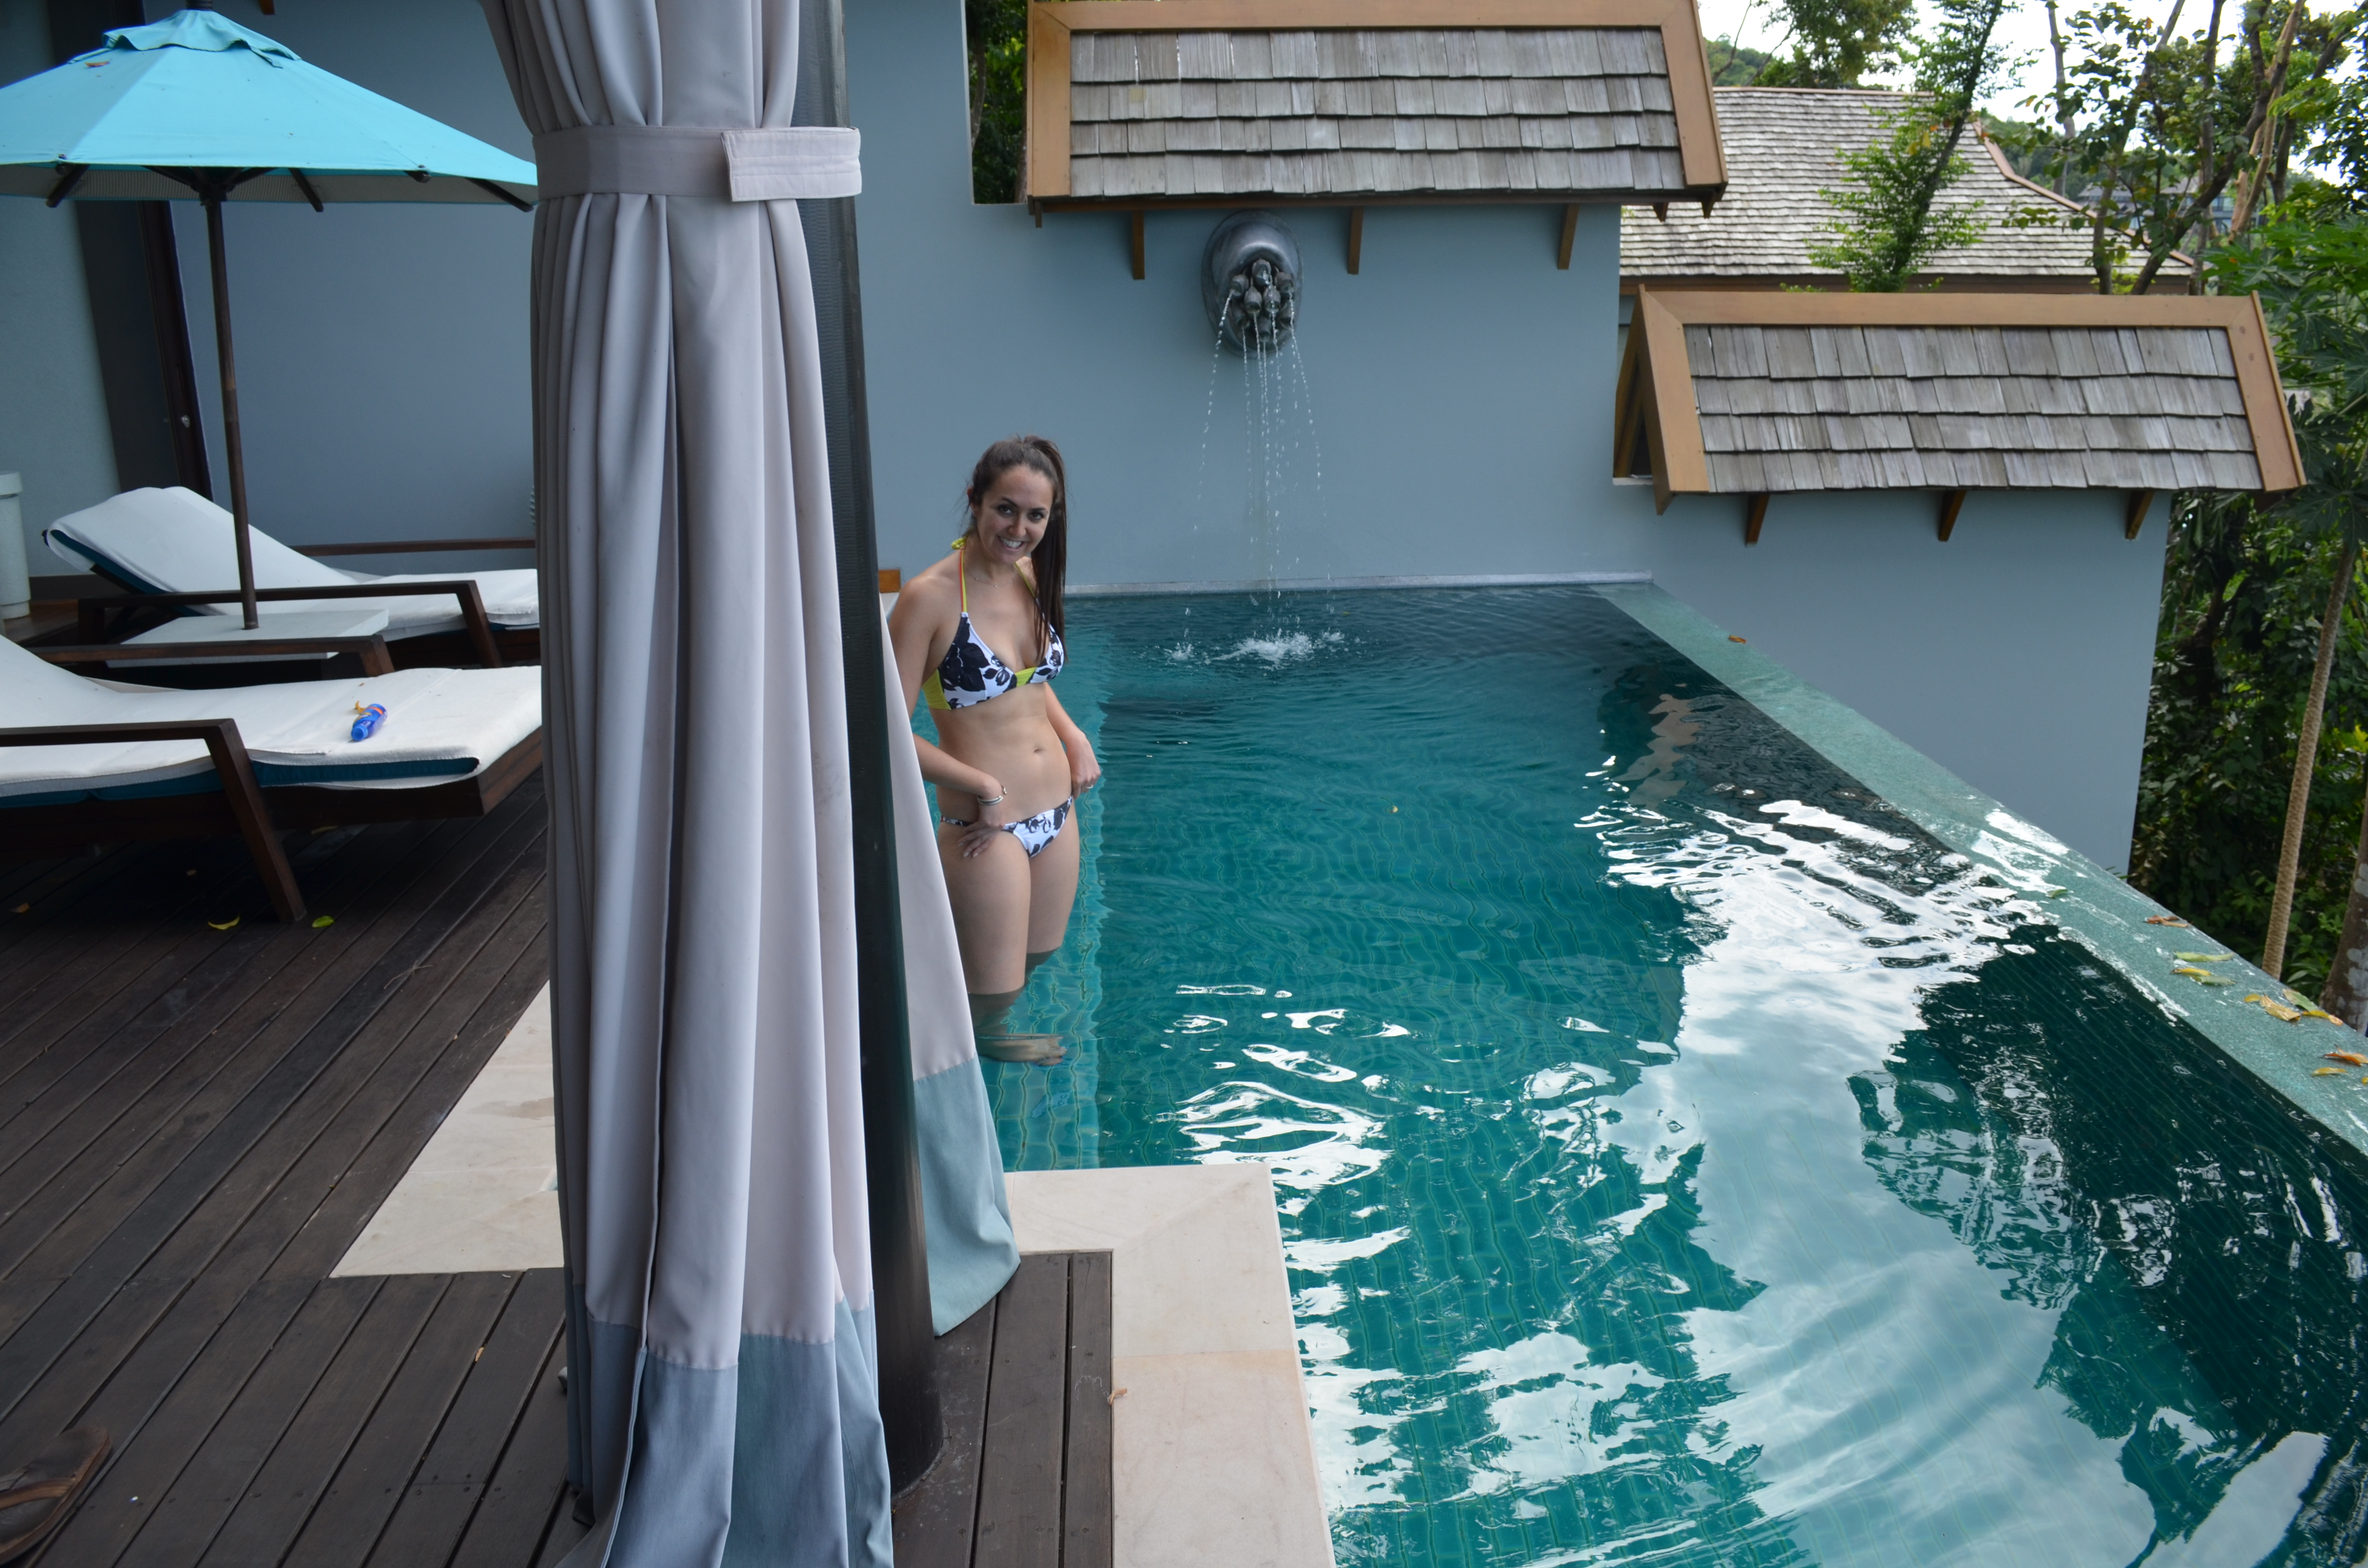 The four seasons nudist resort